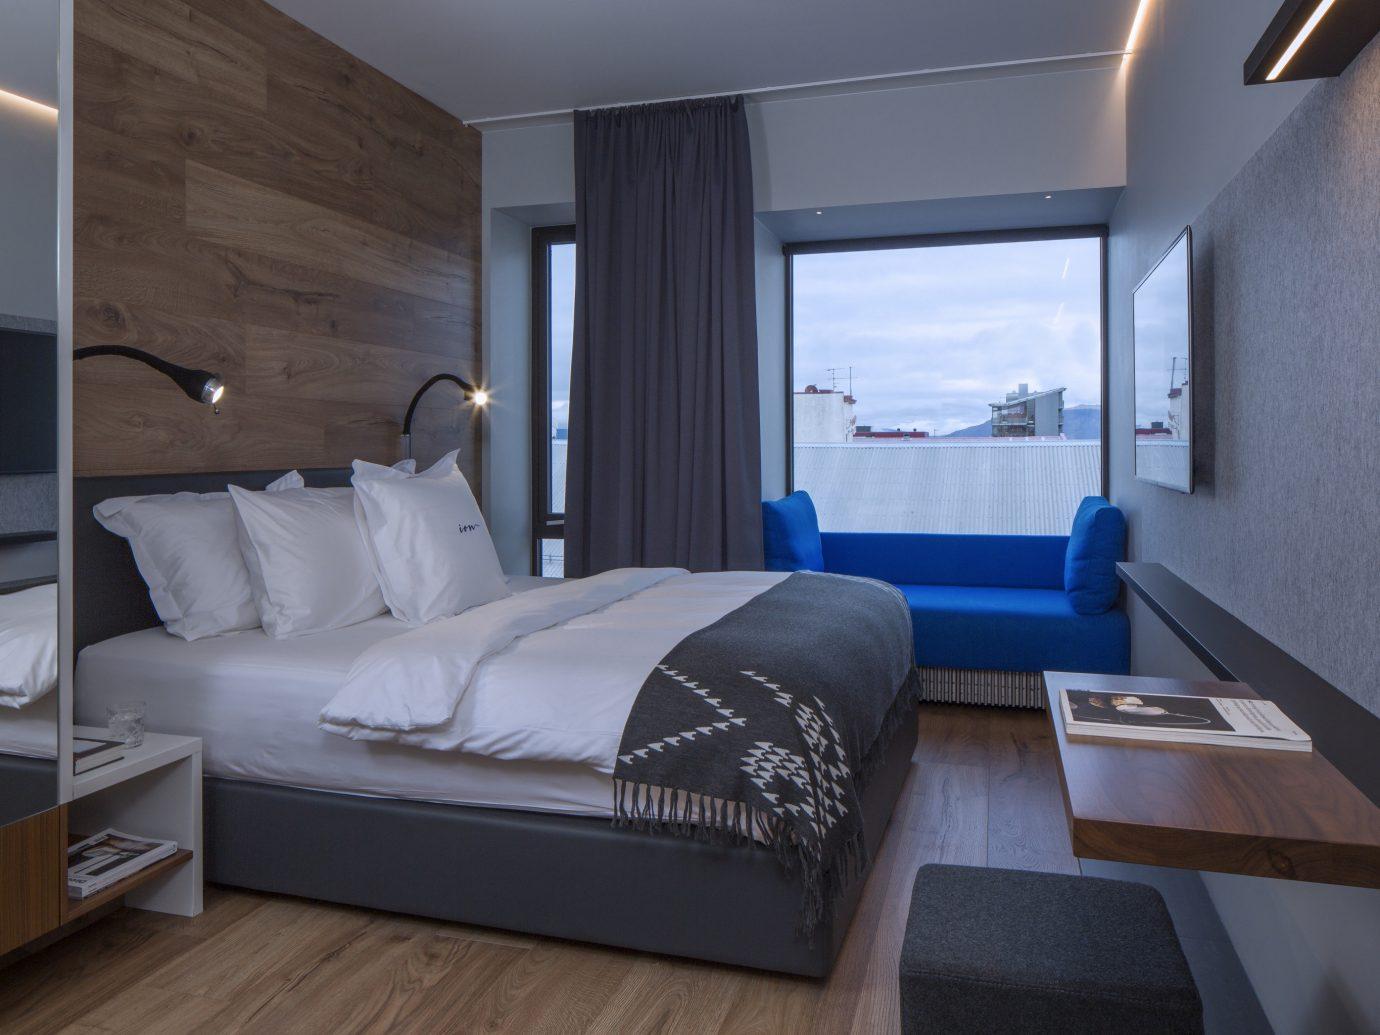 Boutique Hotels Hotels Iceland Outdoors + Adventure Reykjavík Road Trips indoor floor wall window room bed Suite interior design hotel Bedroom ceiling interior designer furniture